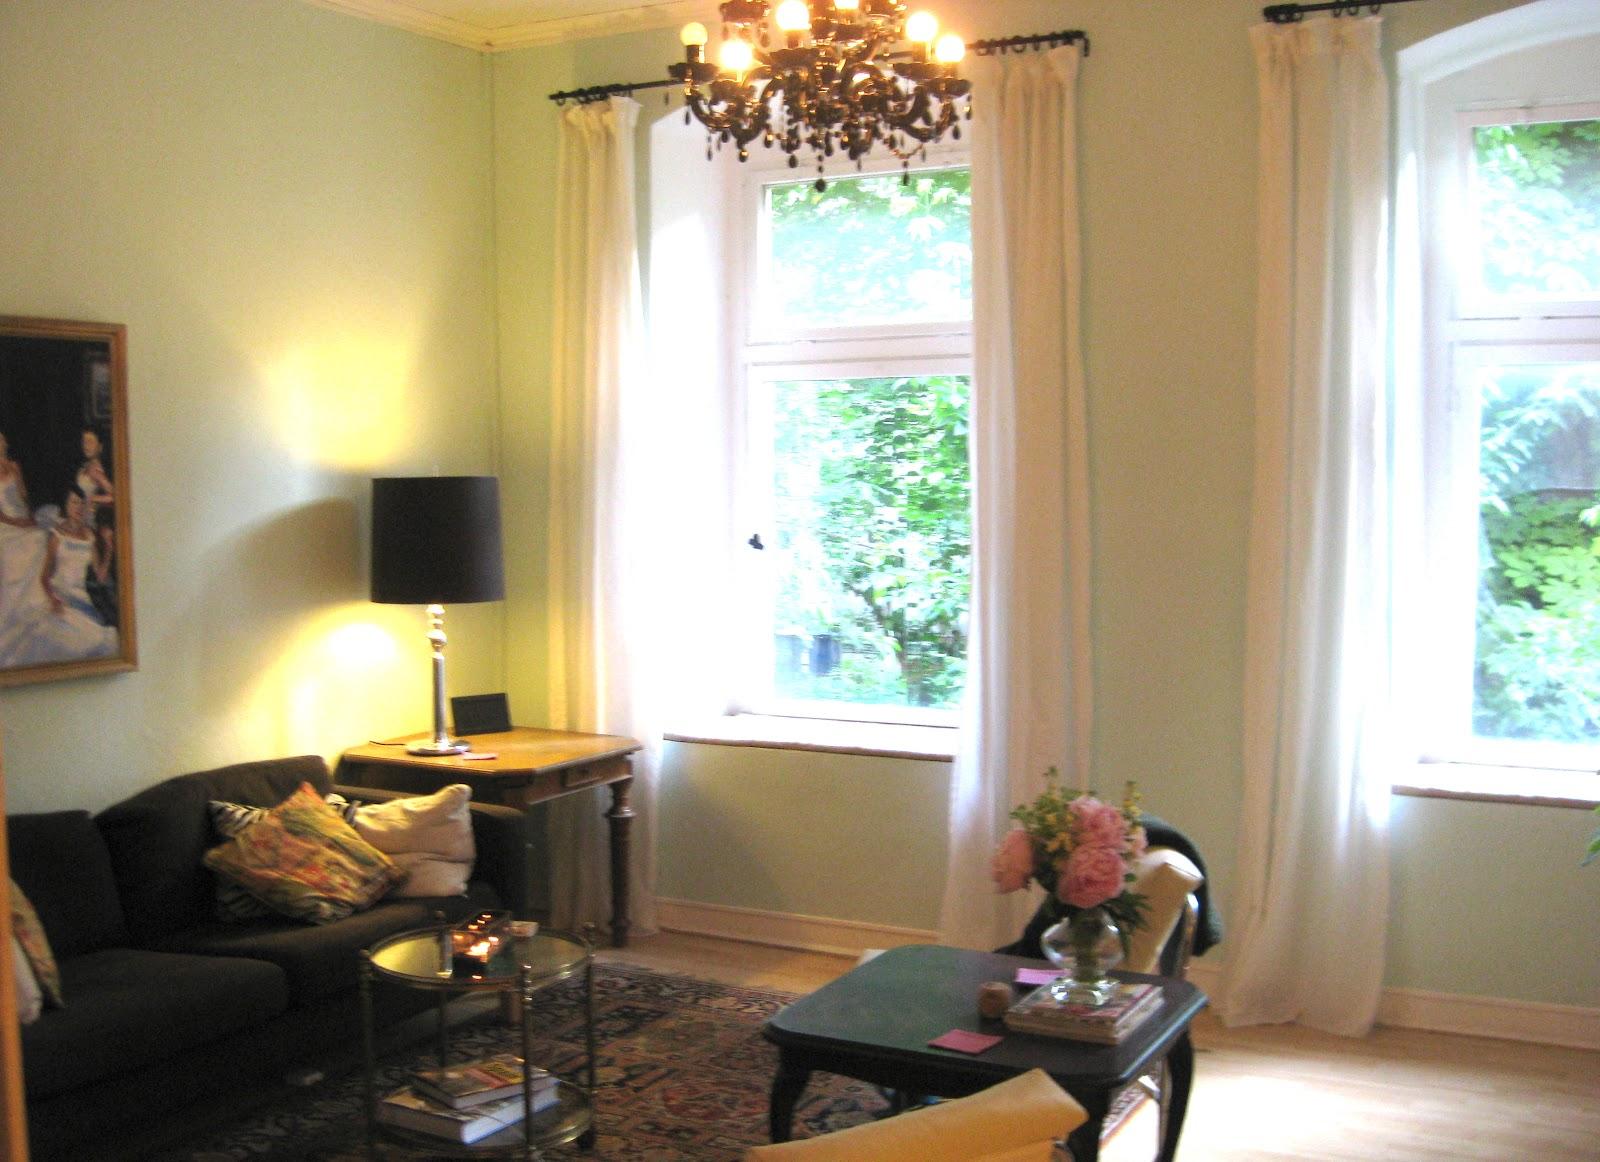 mel liza picking paint colors. Black Bedroom Furniture Sets. Home Design Ideas